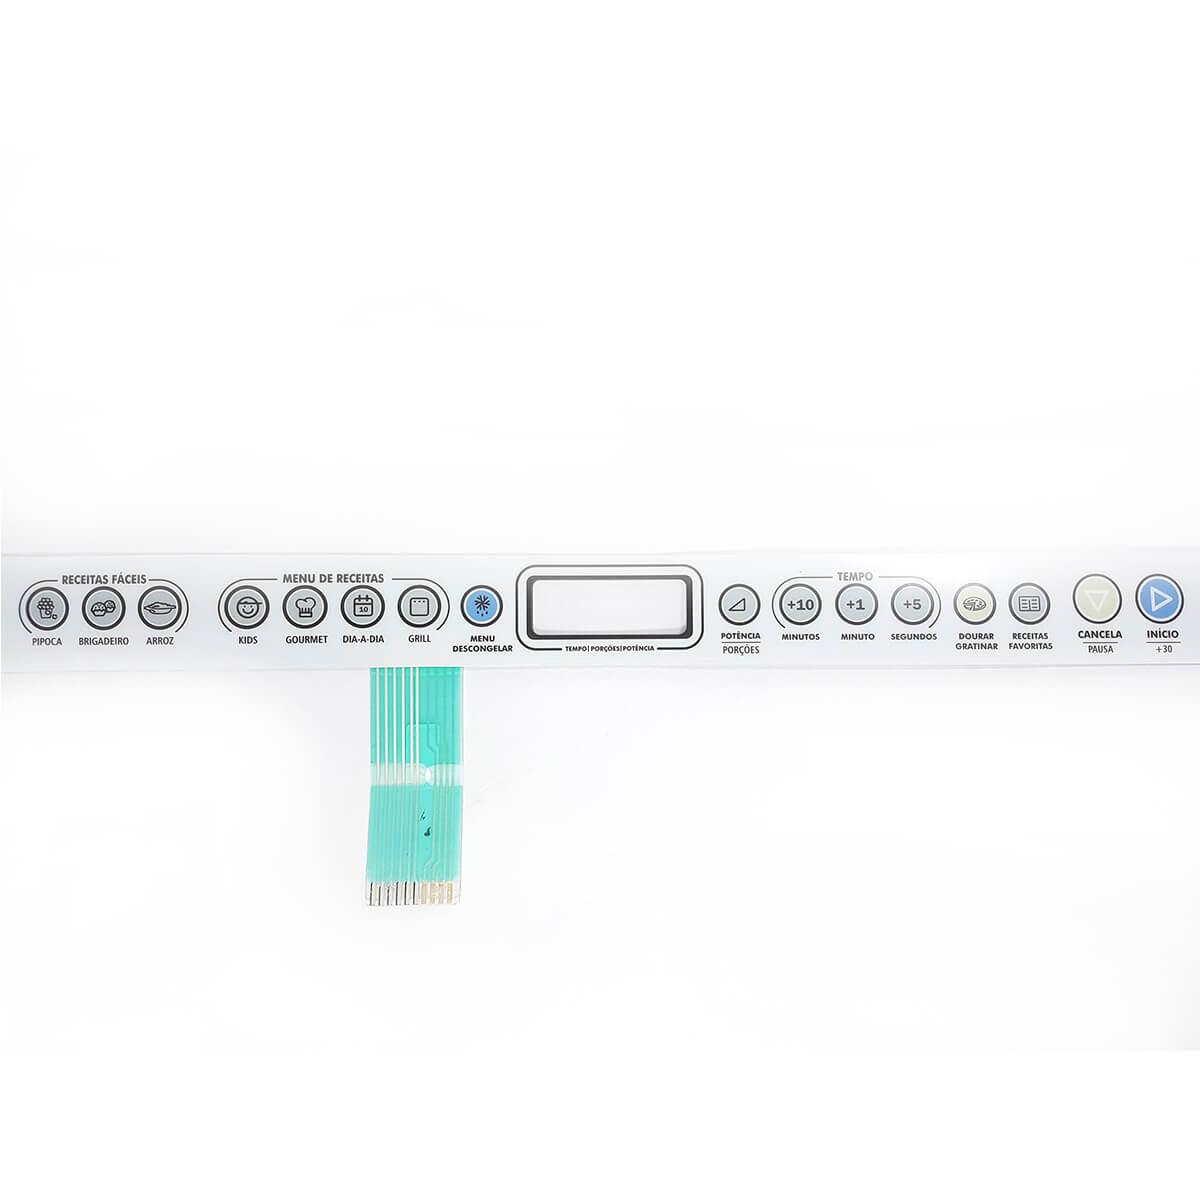 Membrana  Para Microondas Electrolux MG41R JRK - 4113